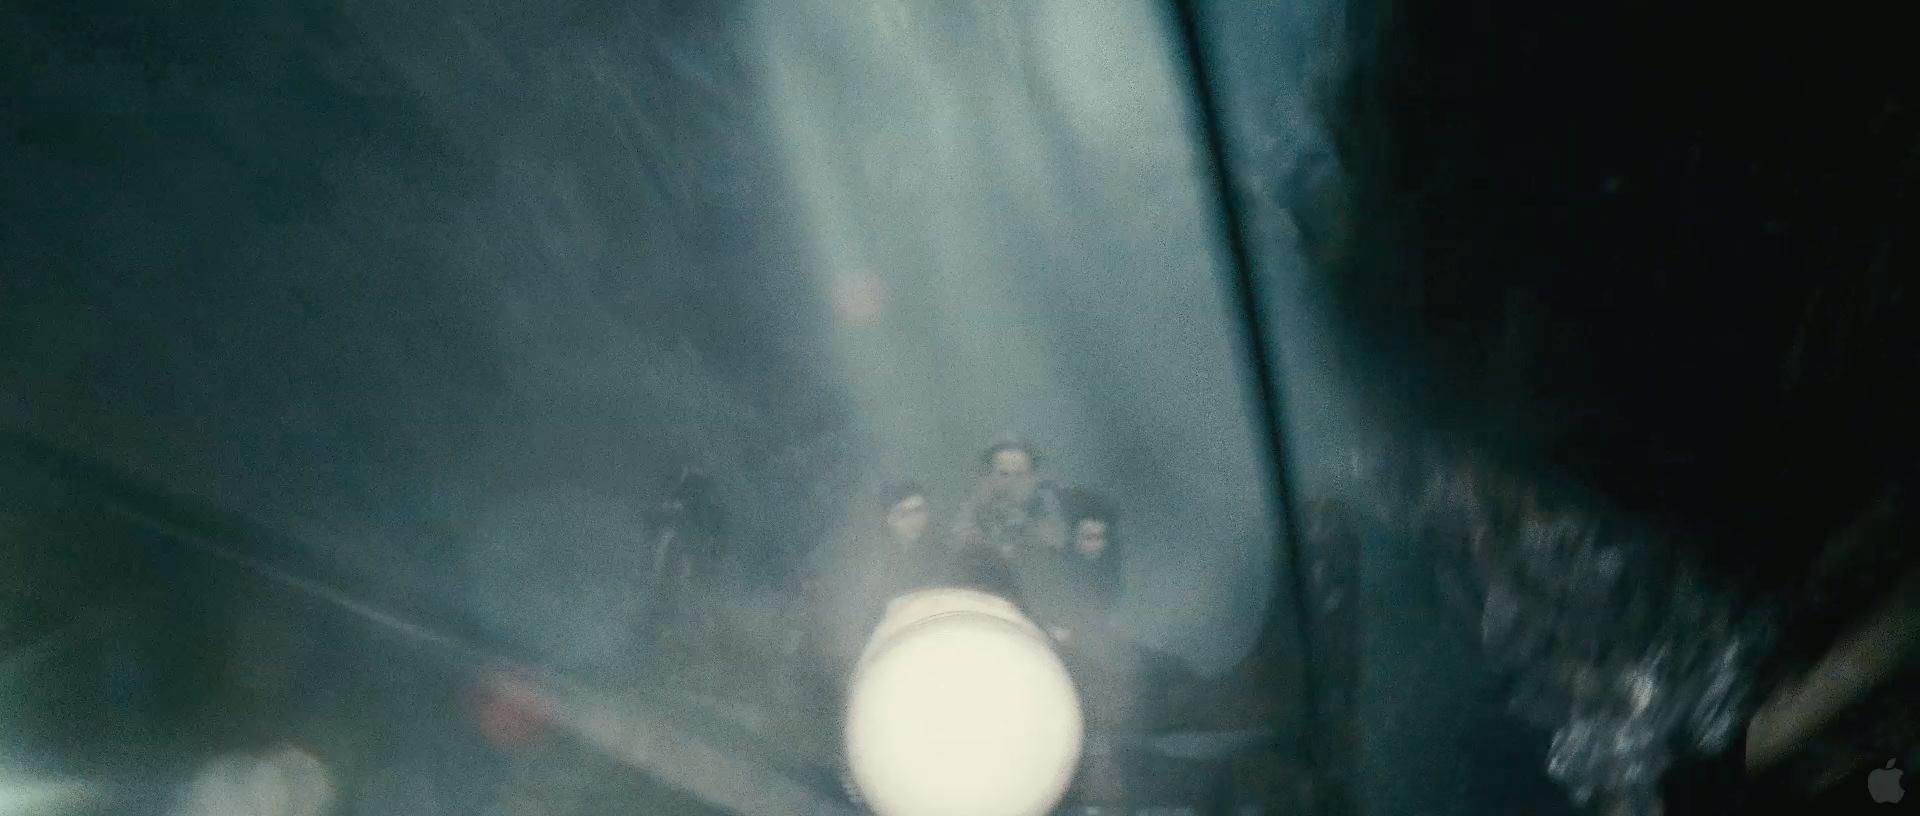 Harry Potter BlogHogwarts HP7 2 Trailer 20